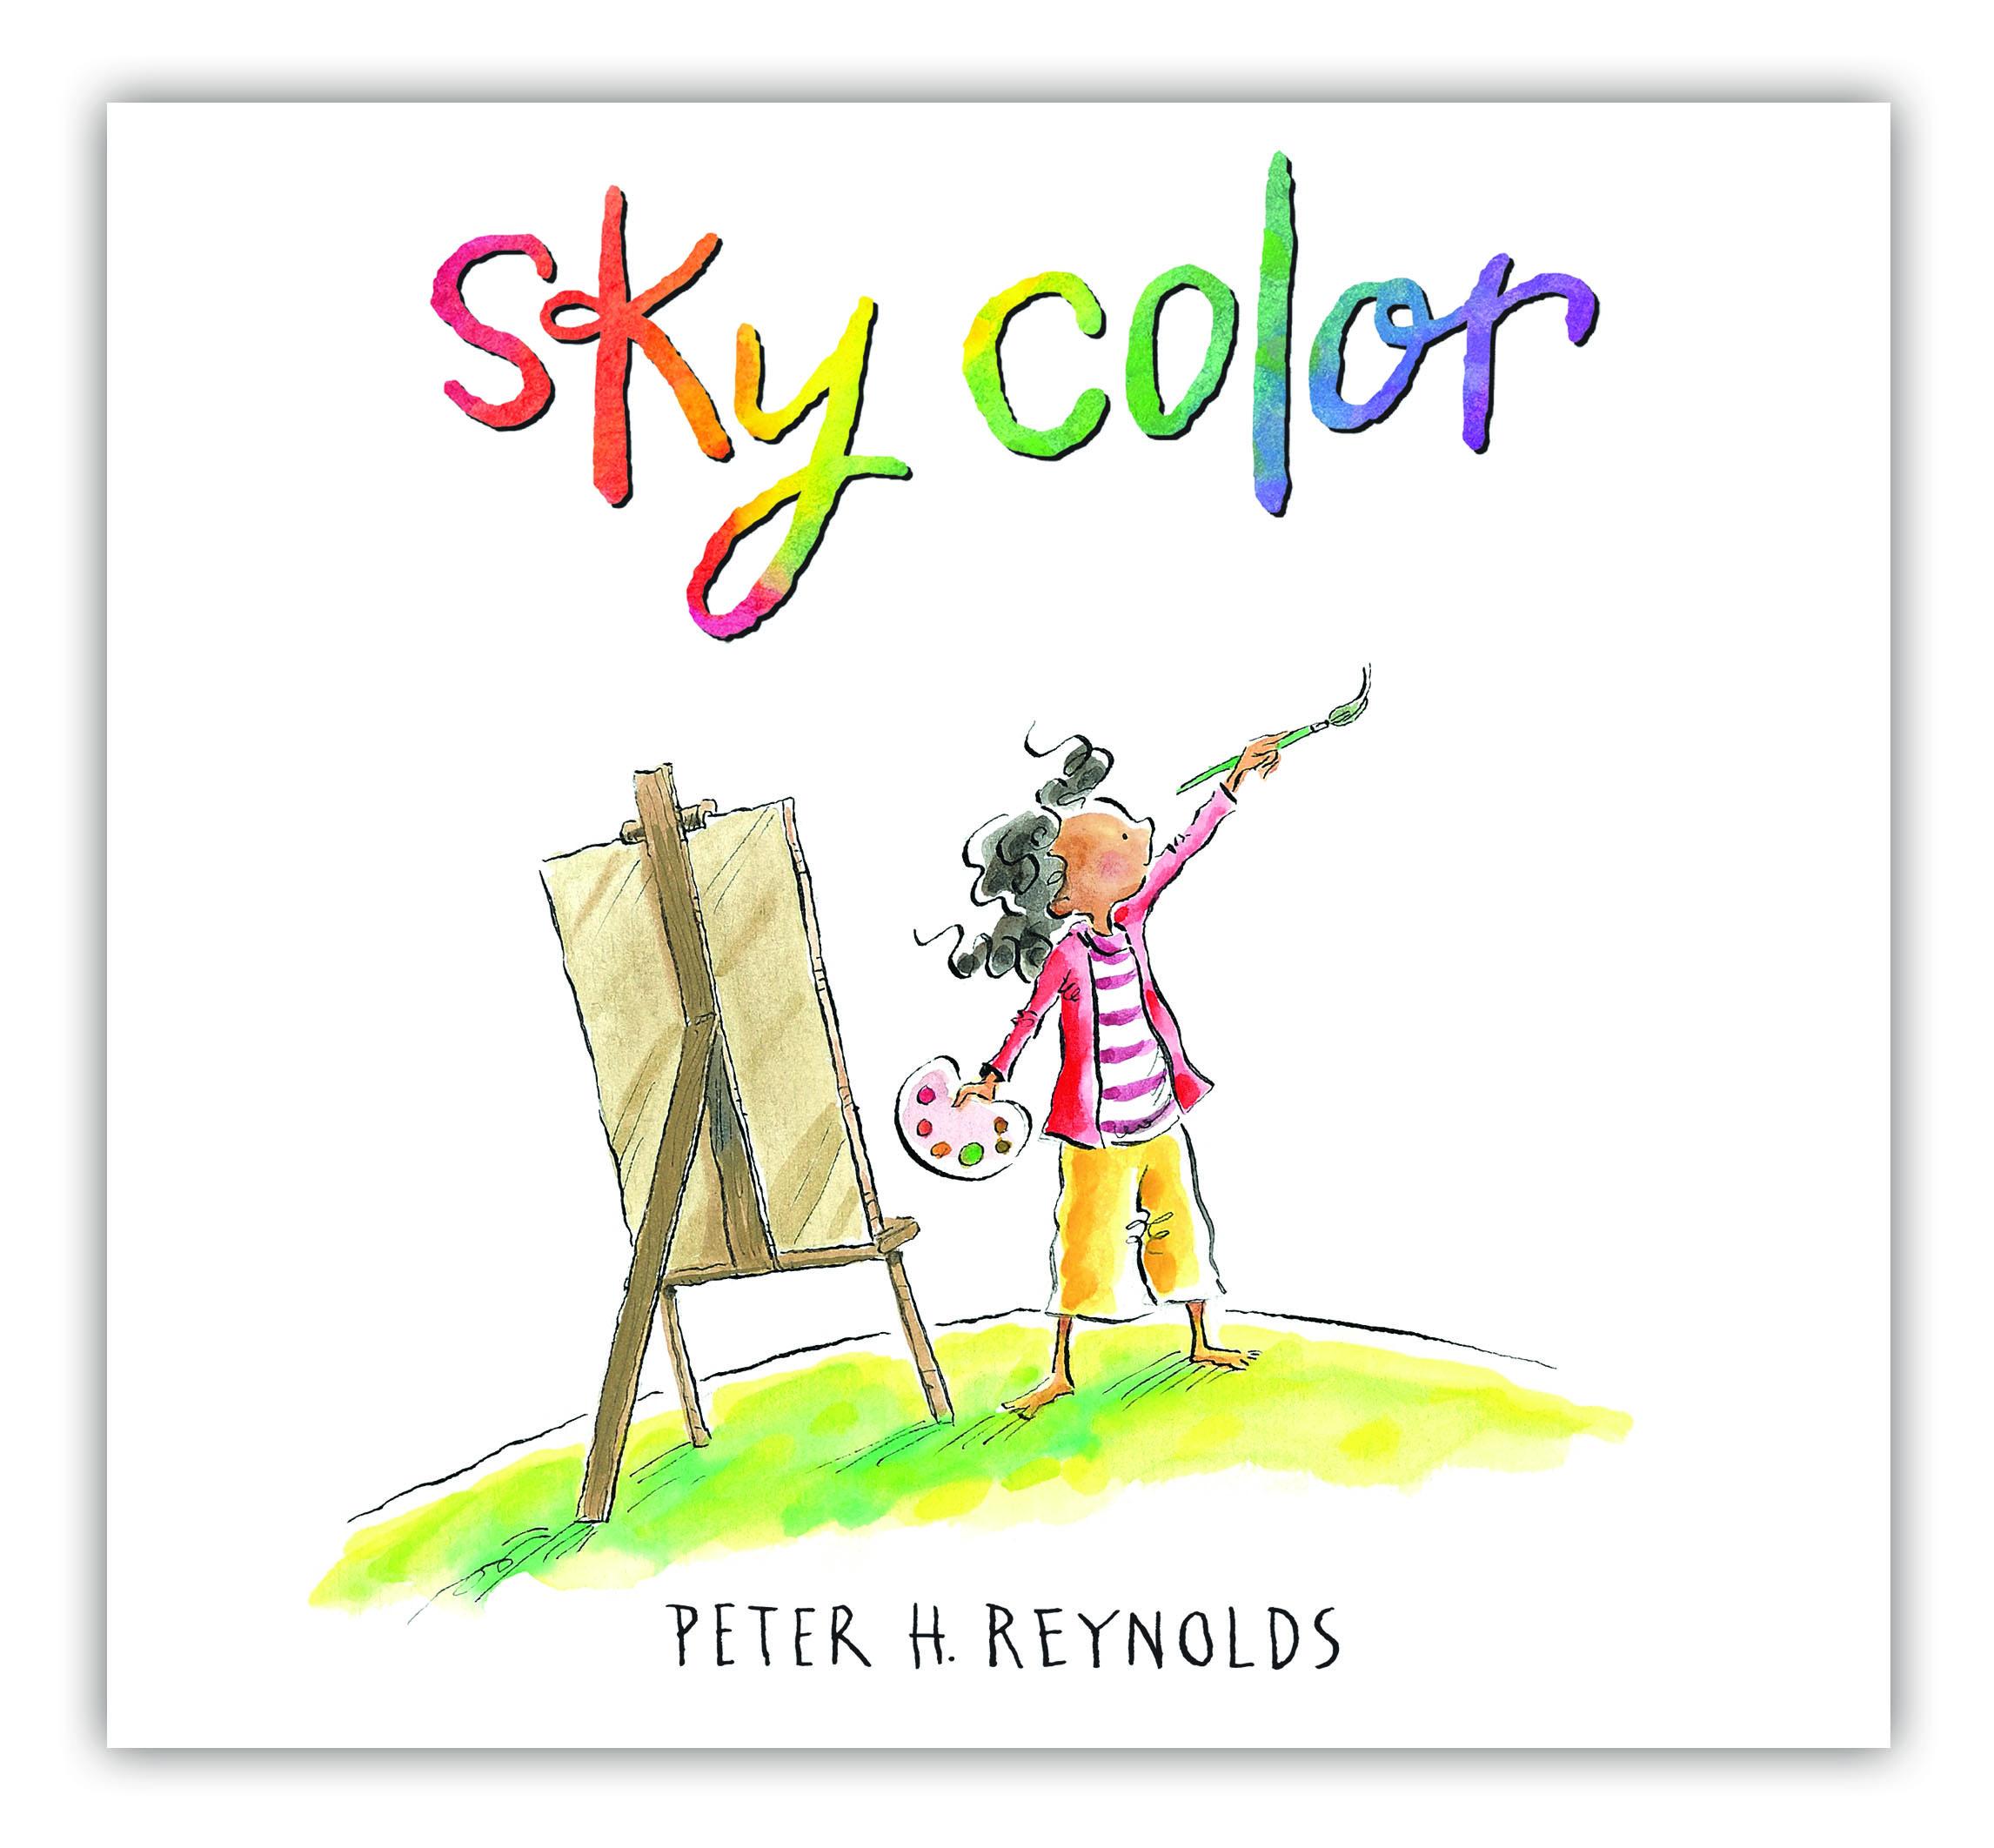 peterhreynolds_skycolor